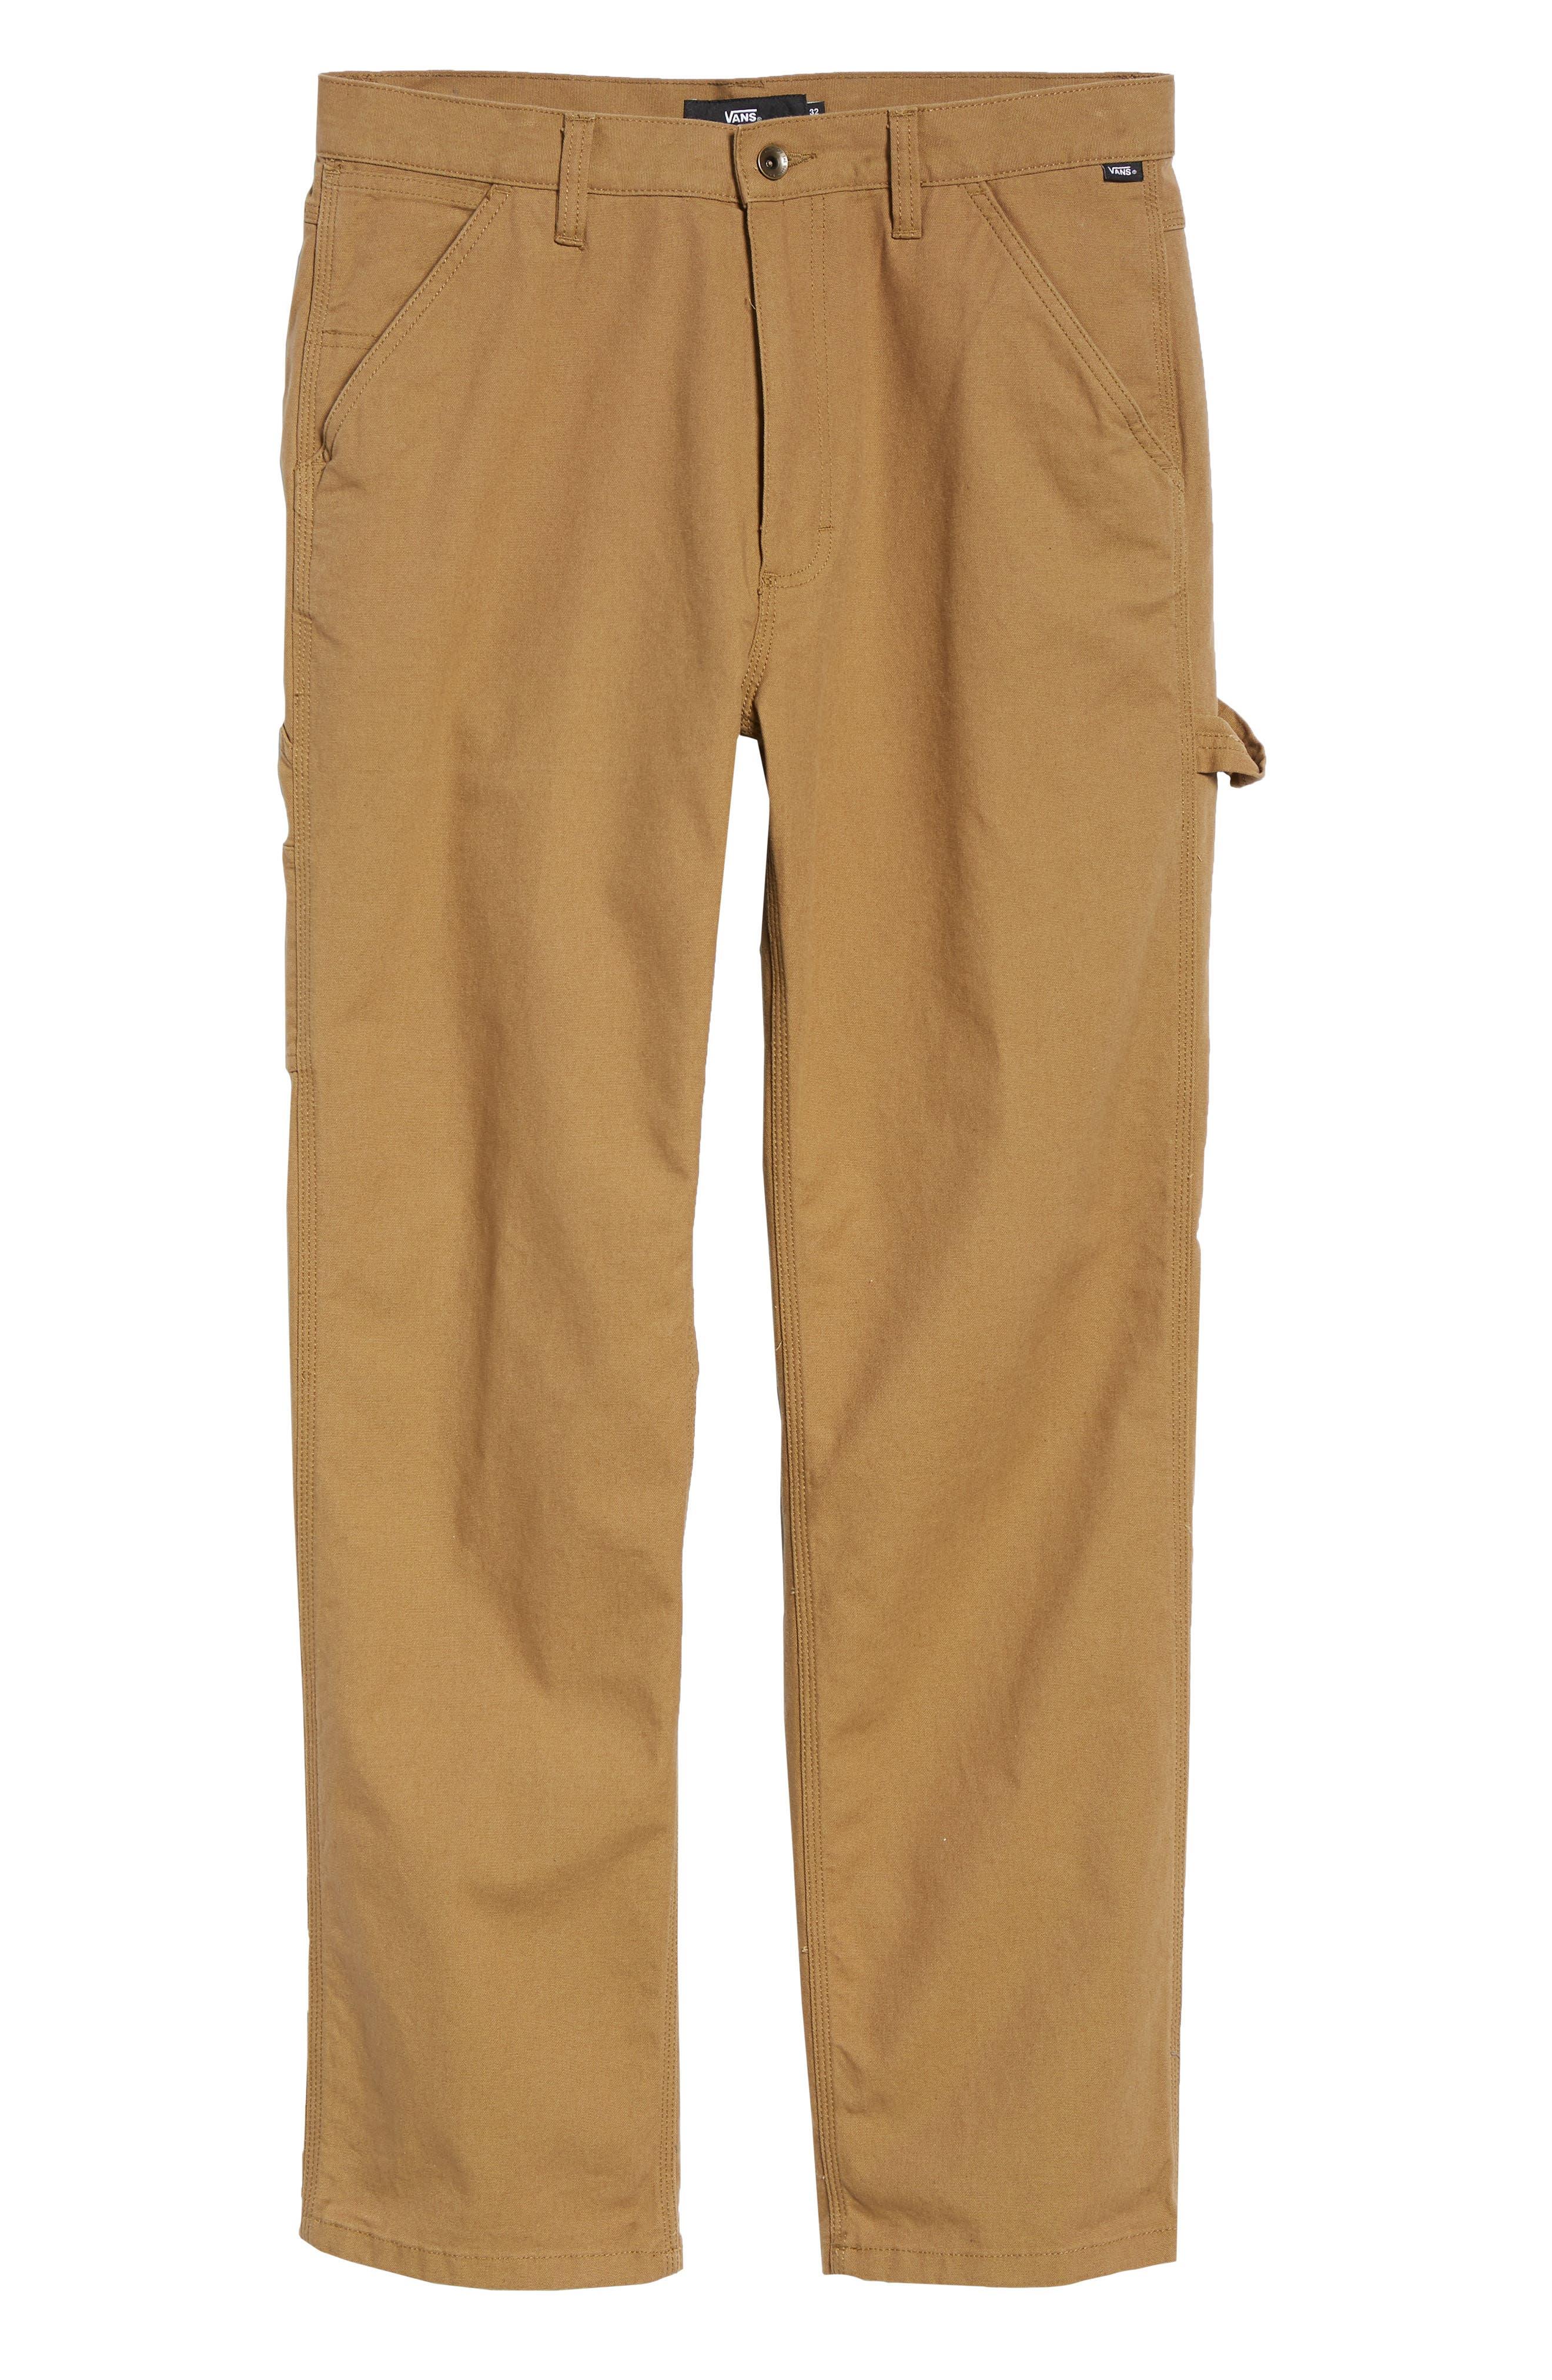 Hardware Straight Fit Carpenter Pants,                             Alternate thumbnail 6, color,                             DIRT